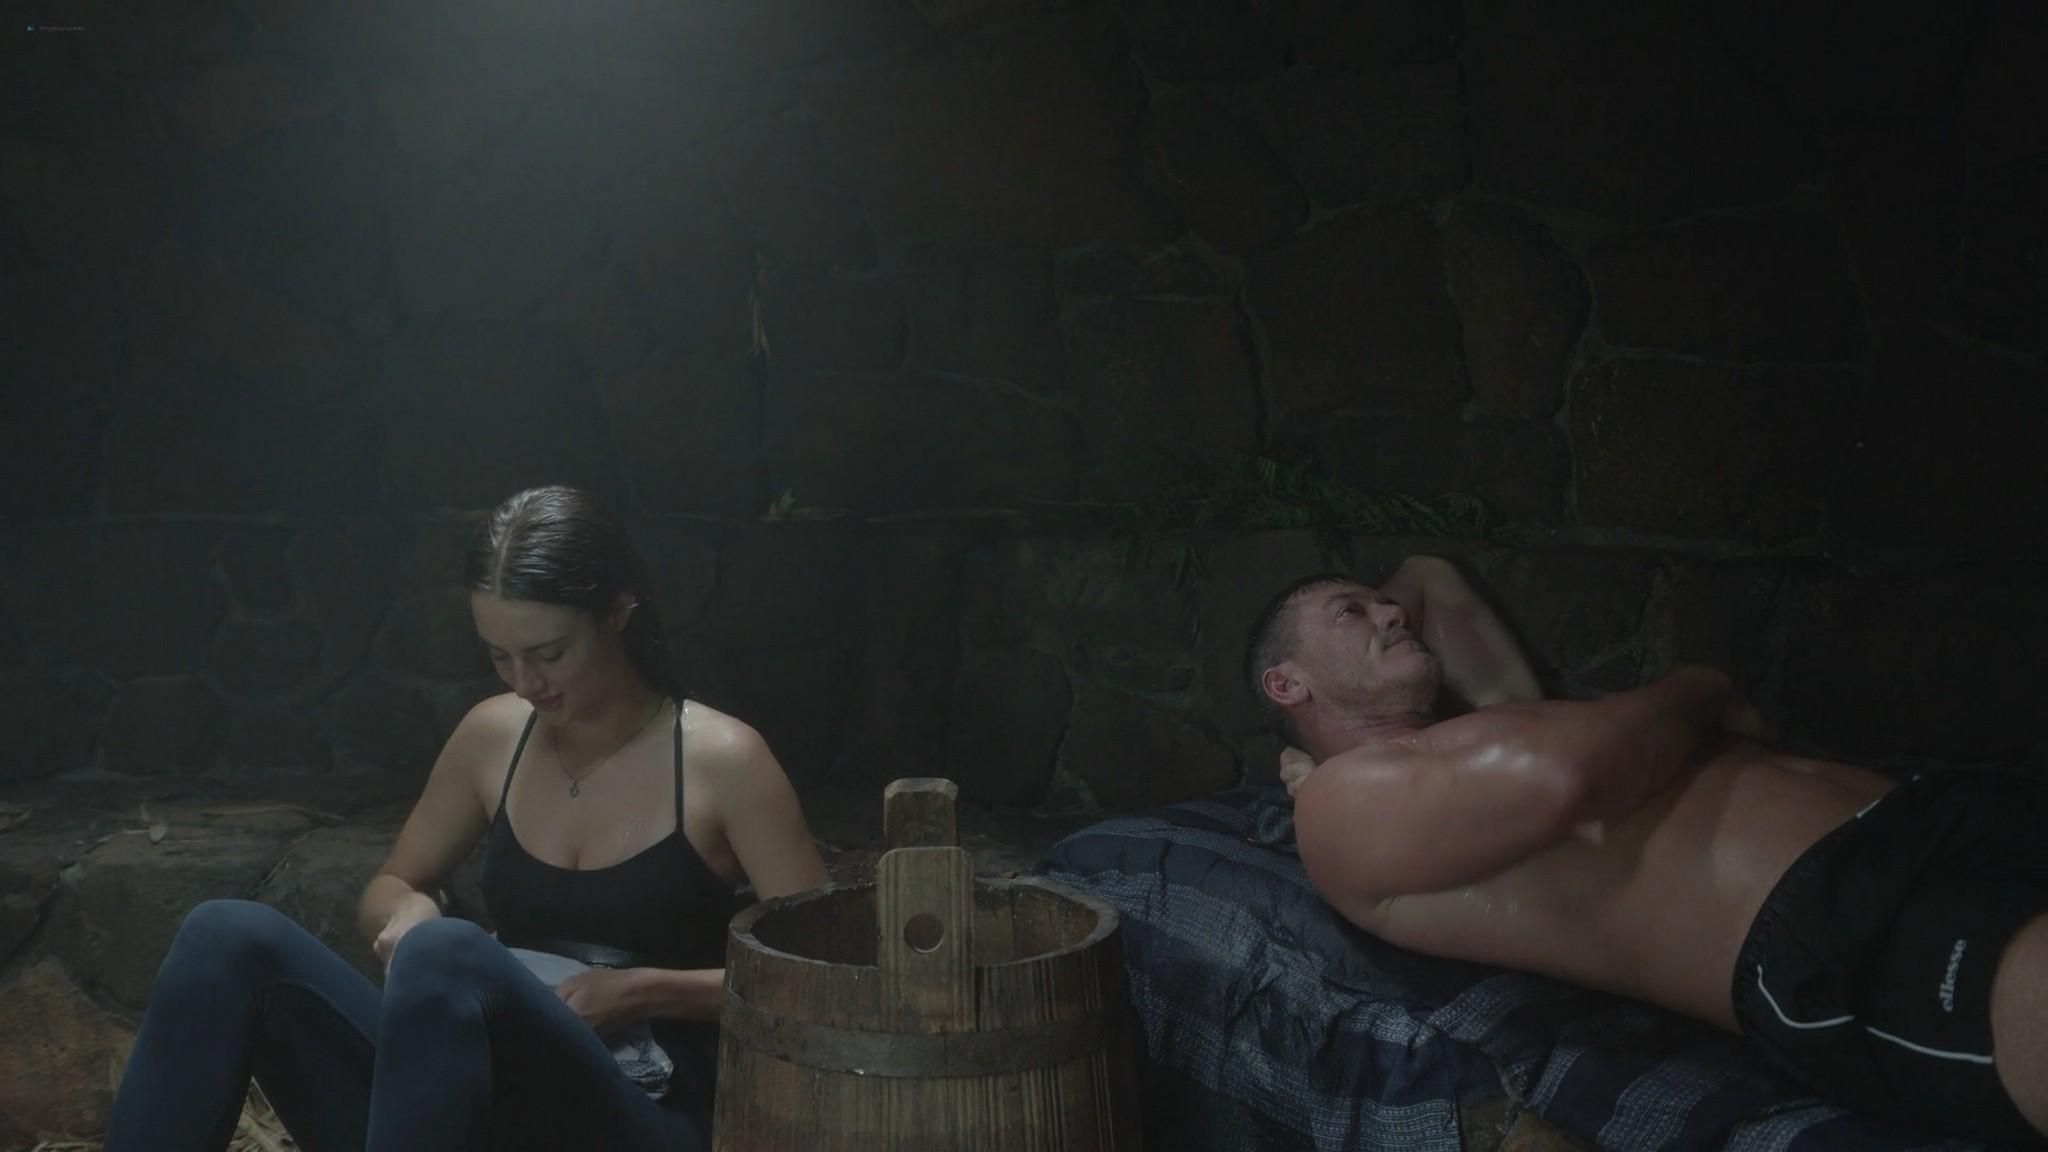 Samara Weaving hot sex Nicole Kidman and others sexy Nine Perfect Strangers 2021 s1e5 1080p 8